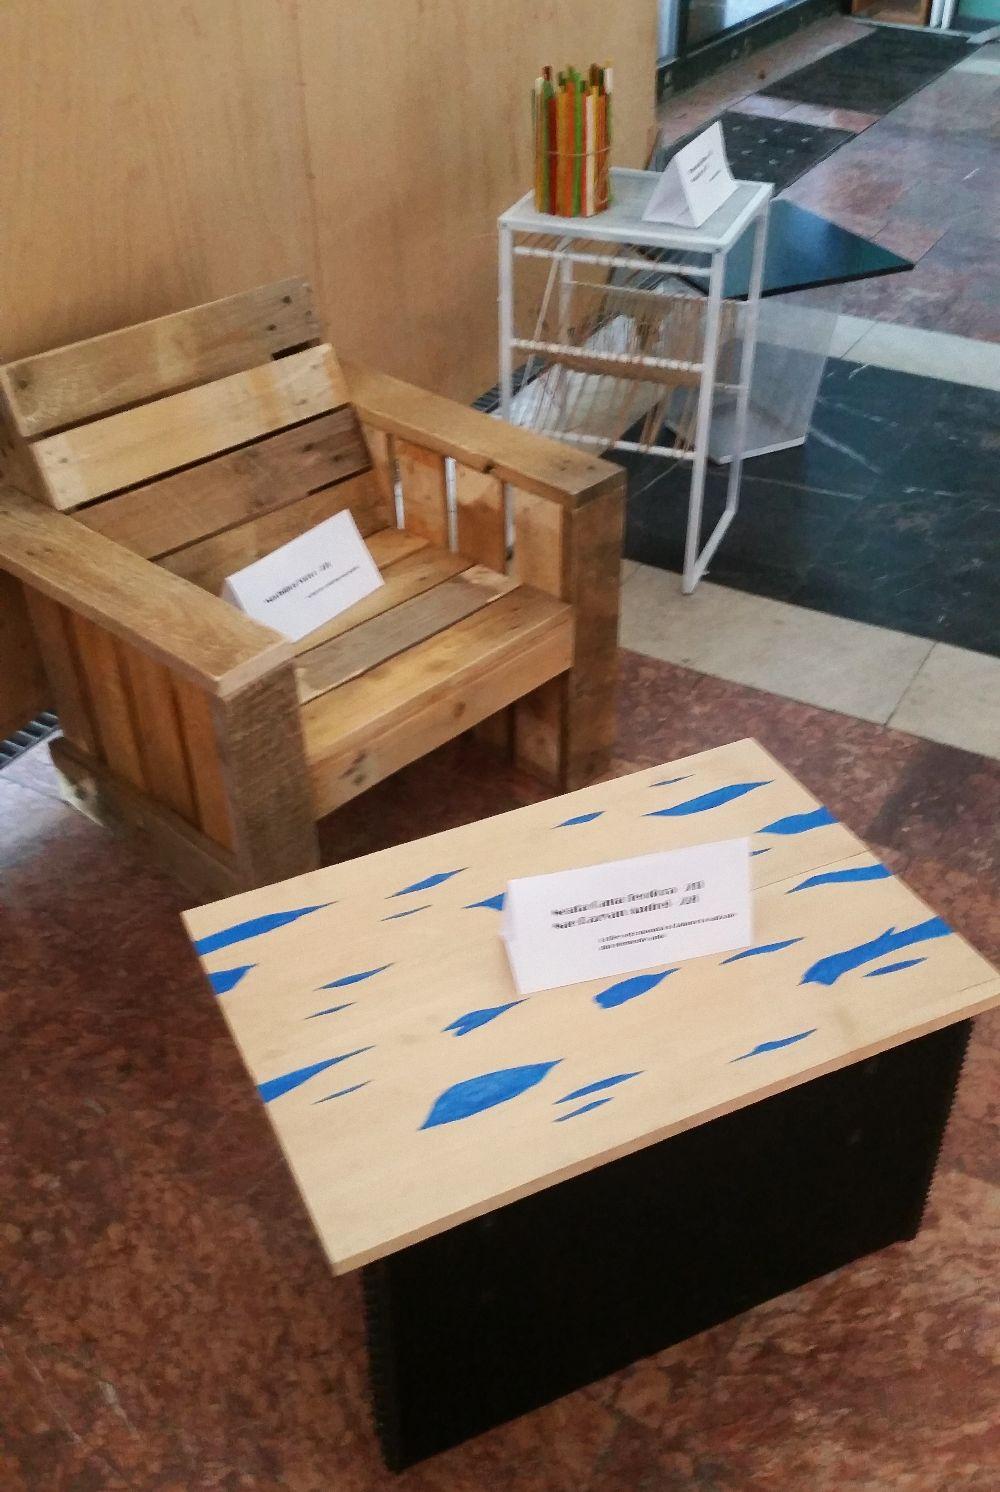 adelaparvu.com despre expozitia cu obiecte reciclate a Studentilor la arhitectura de interior UNAUIM, editia a 6 a (18)